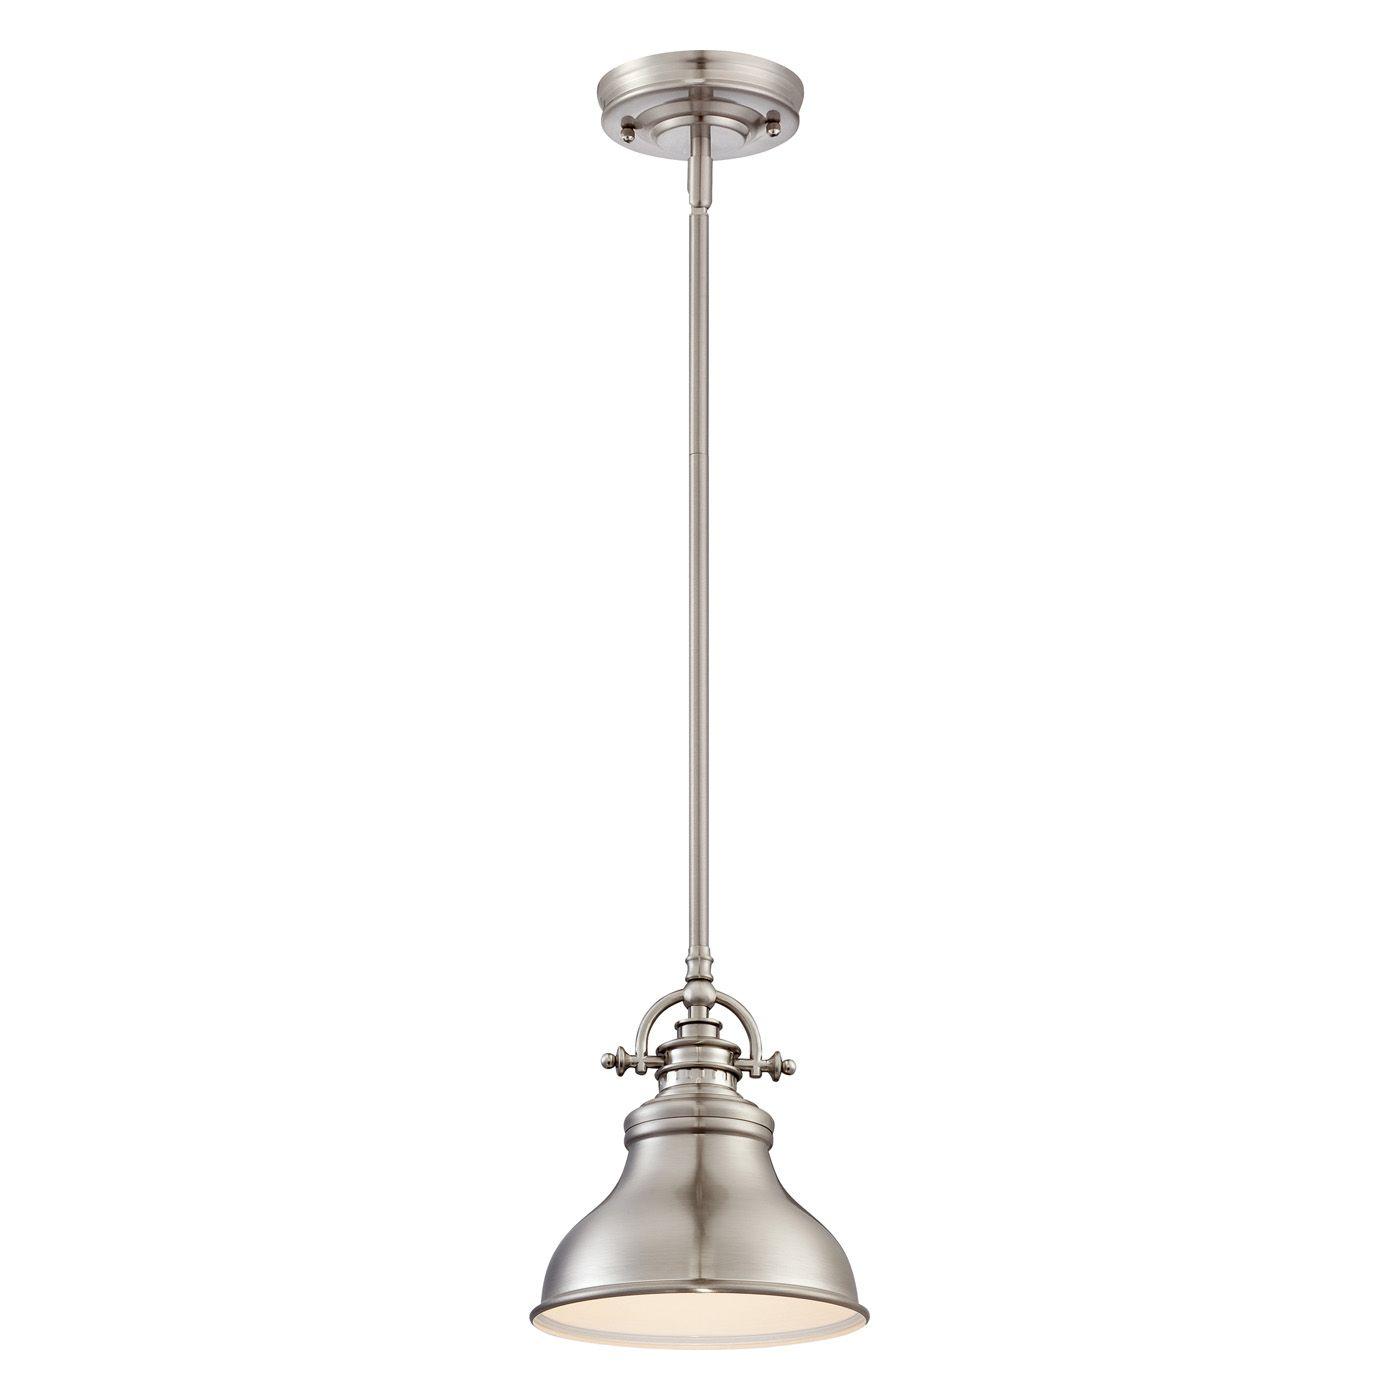 Quoizel Er1508 1 Light Emery Rod Hung Mini Pendant At Atg Stores Brushed Nickel Pendant Lights